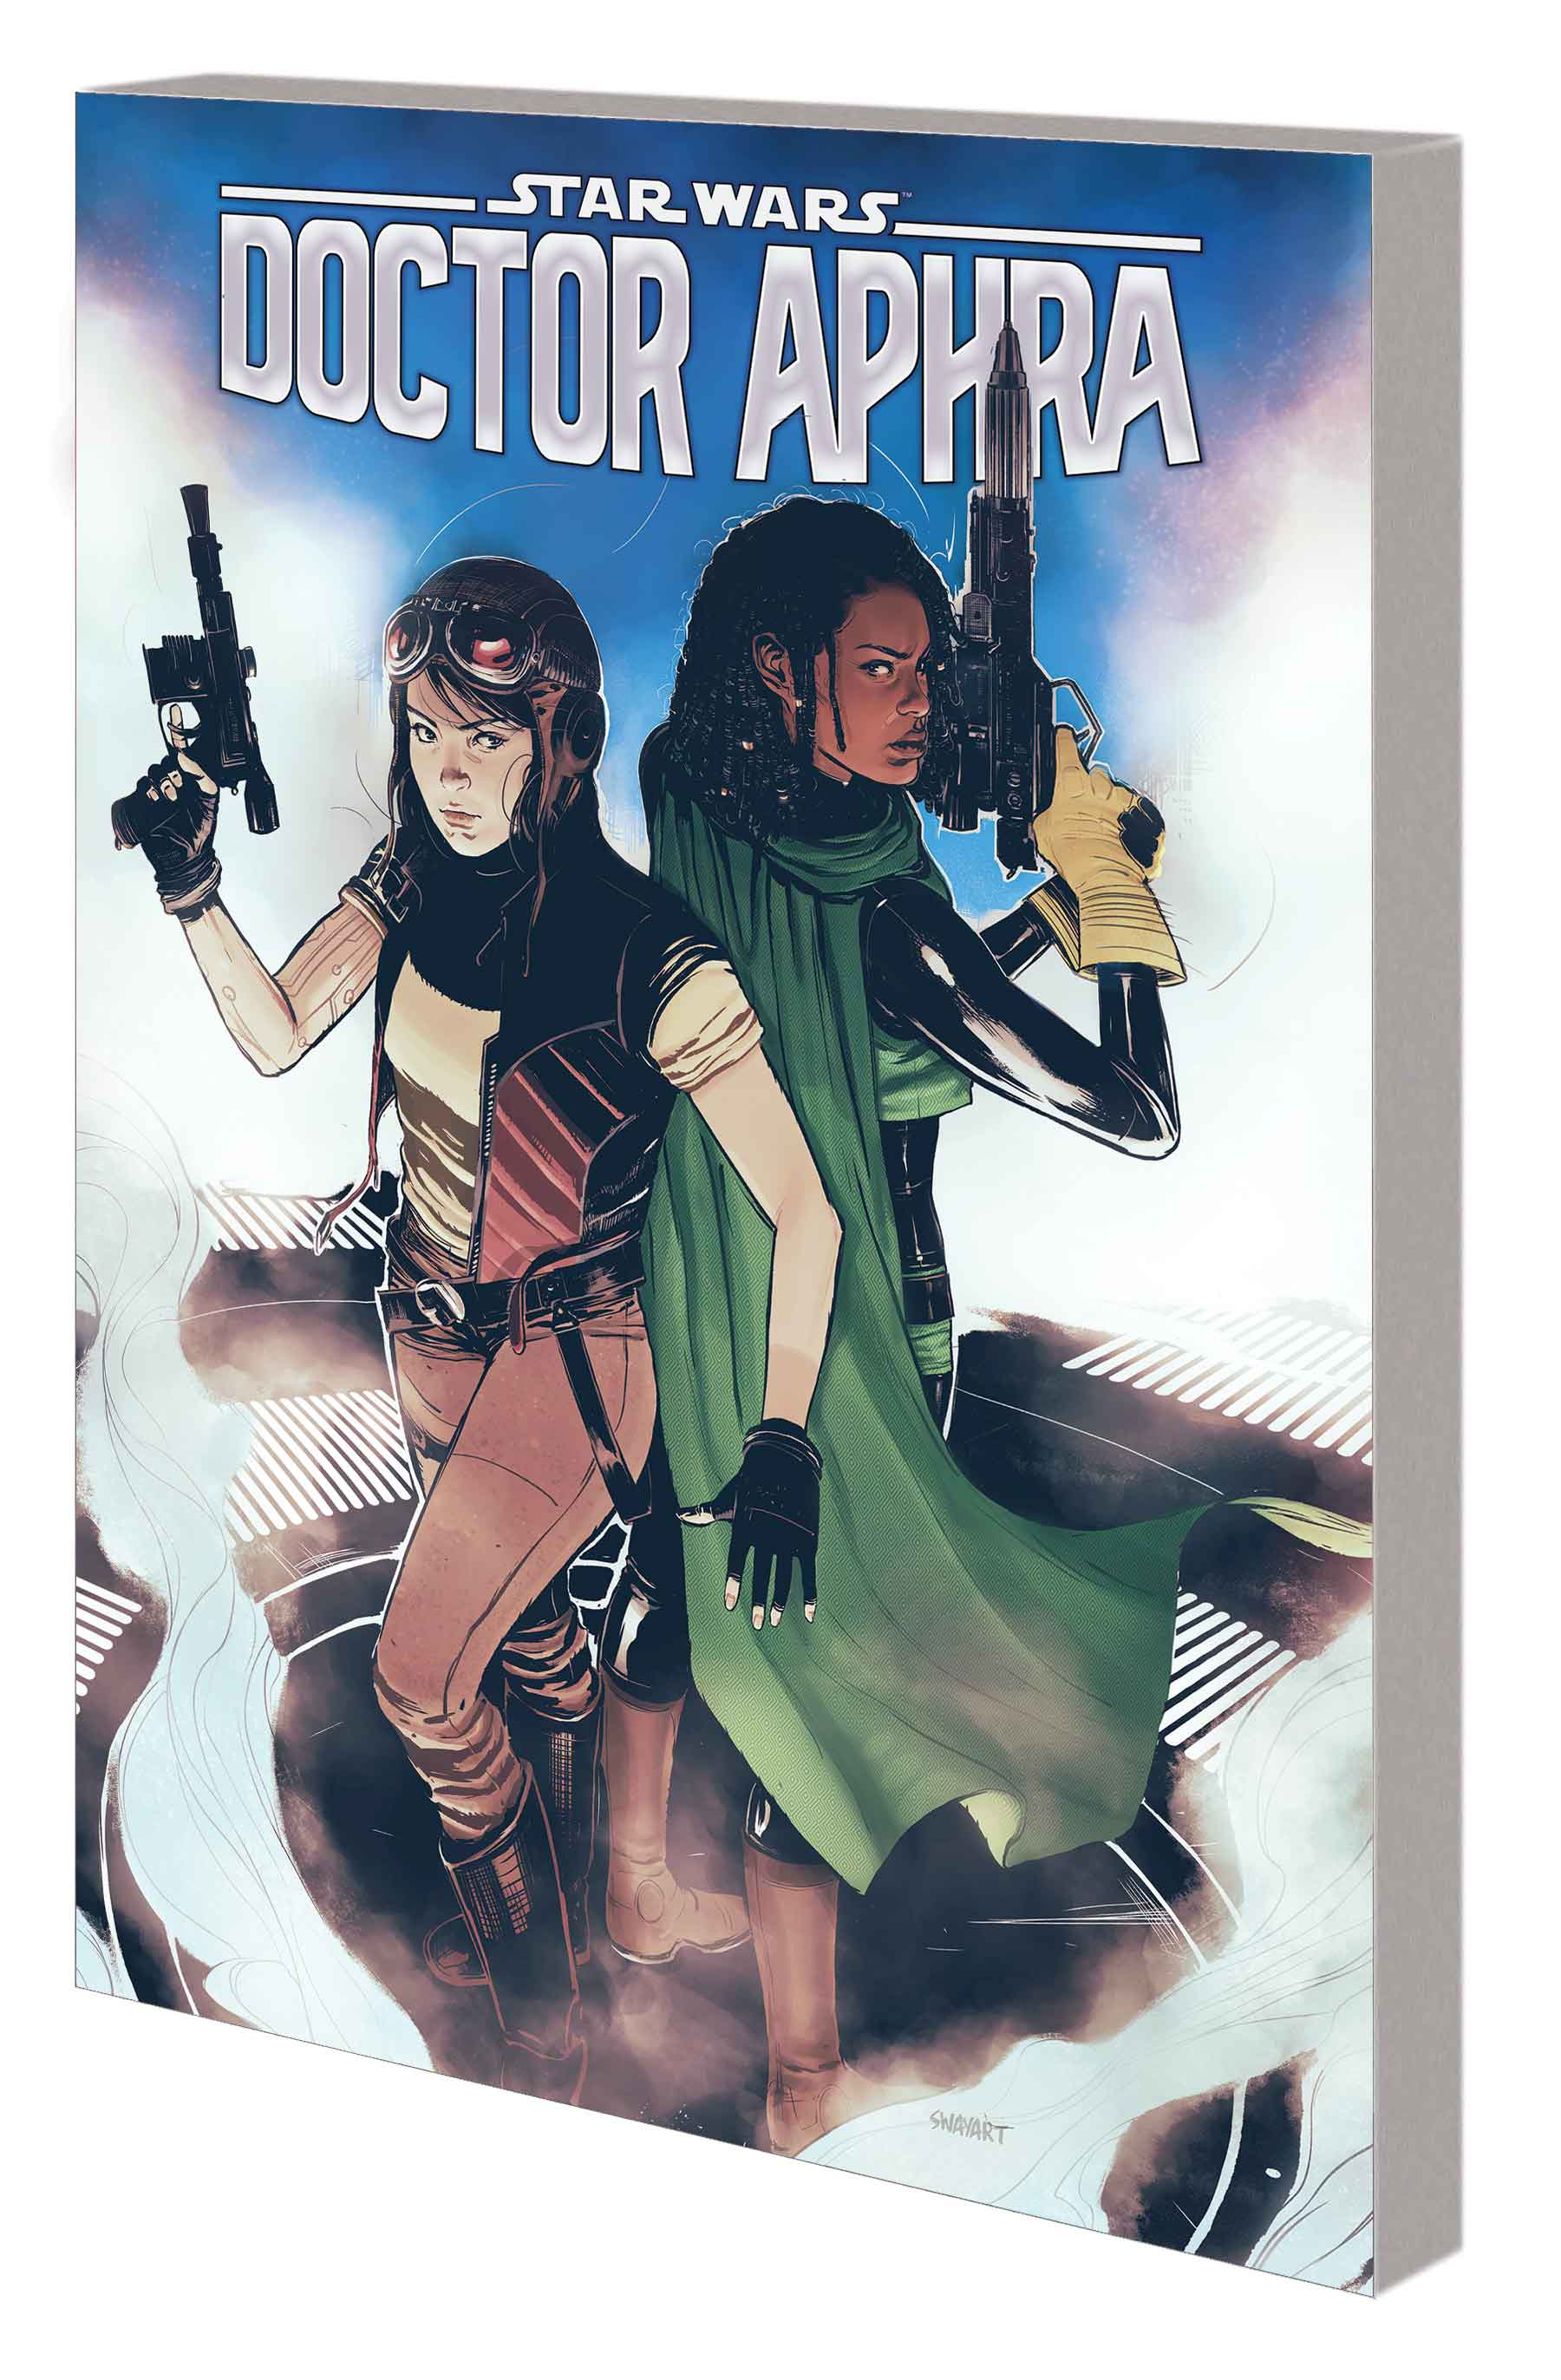 STAR WARS: DOCTOR APHRA VOL. 2 - THE ENGINE JOB TPB (Trade Paperback)